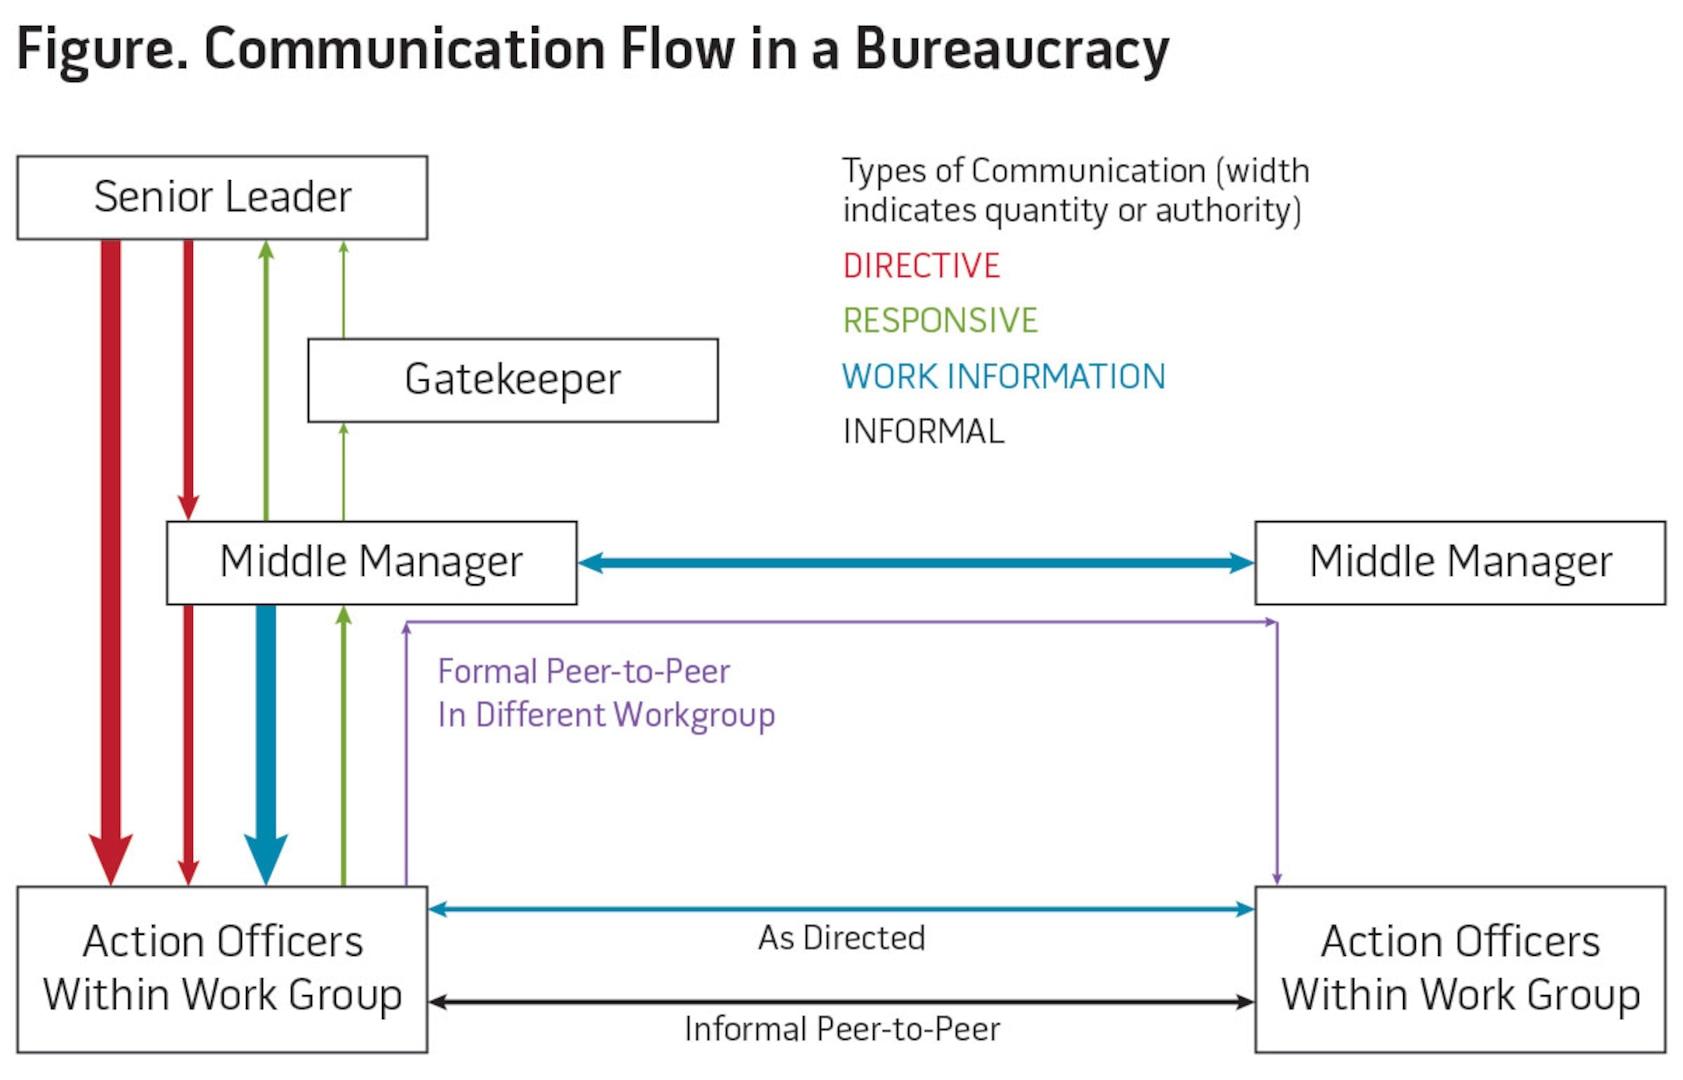 Figure. Communication Flow in a Bureaucracy